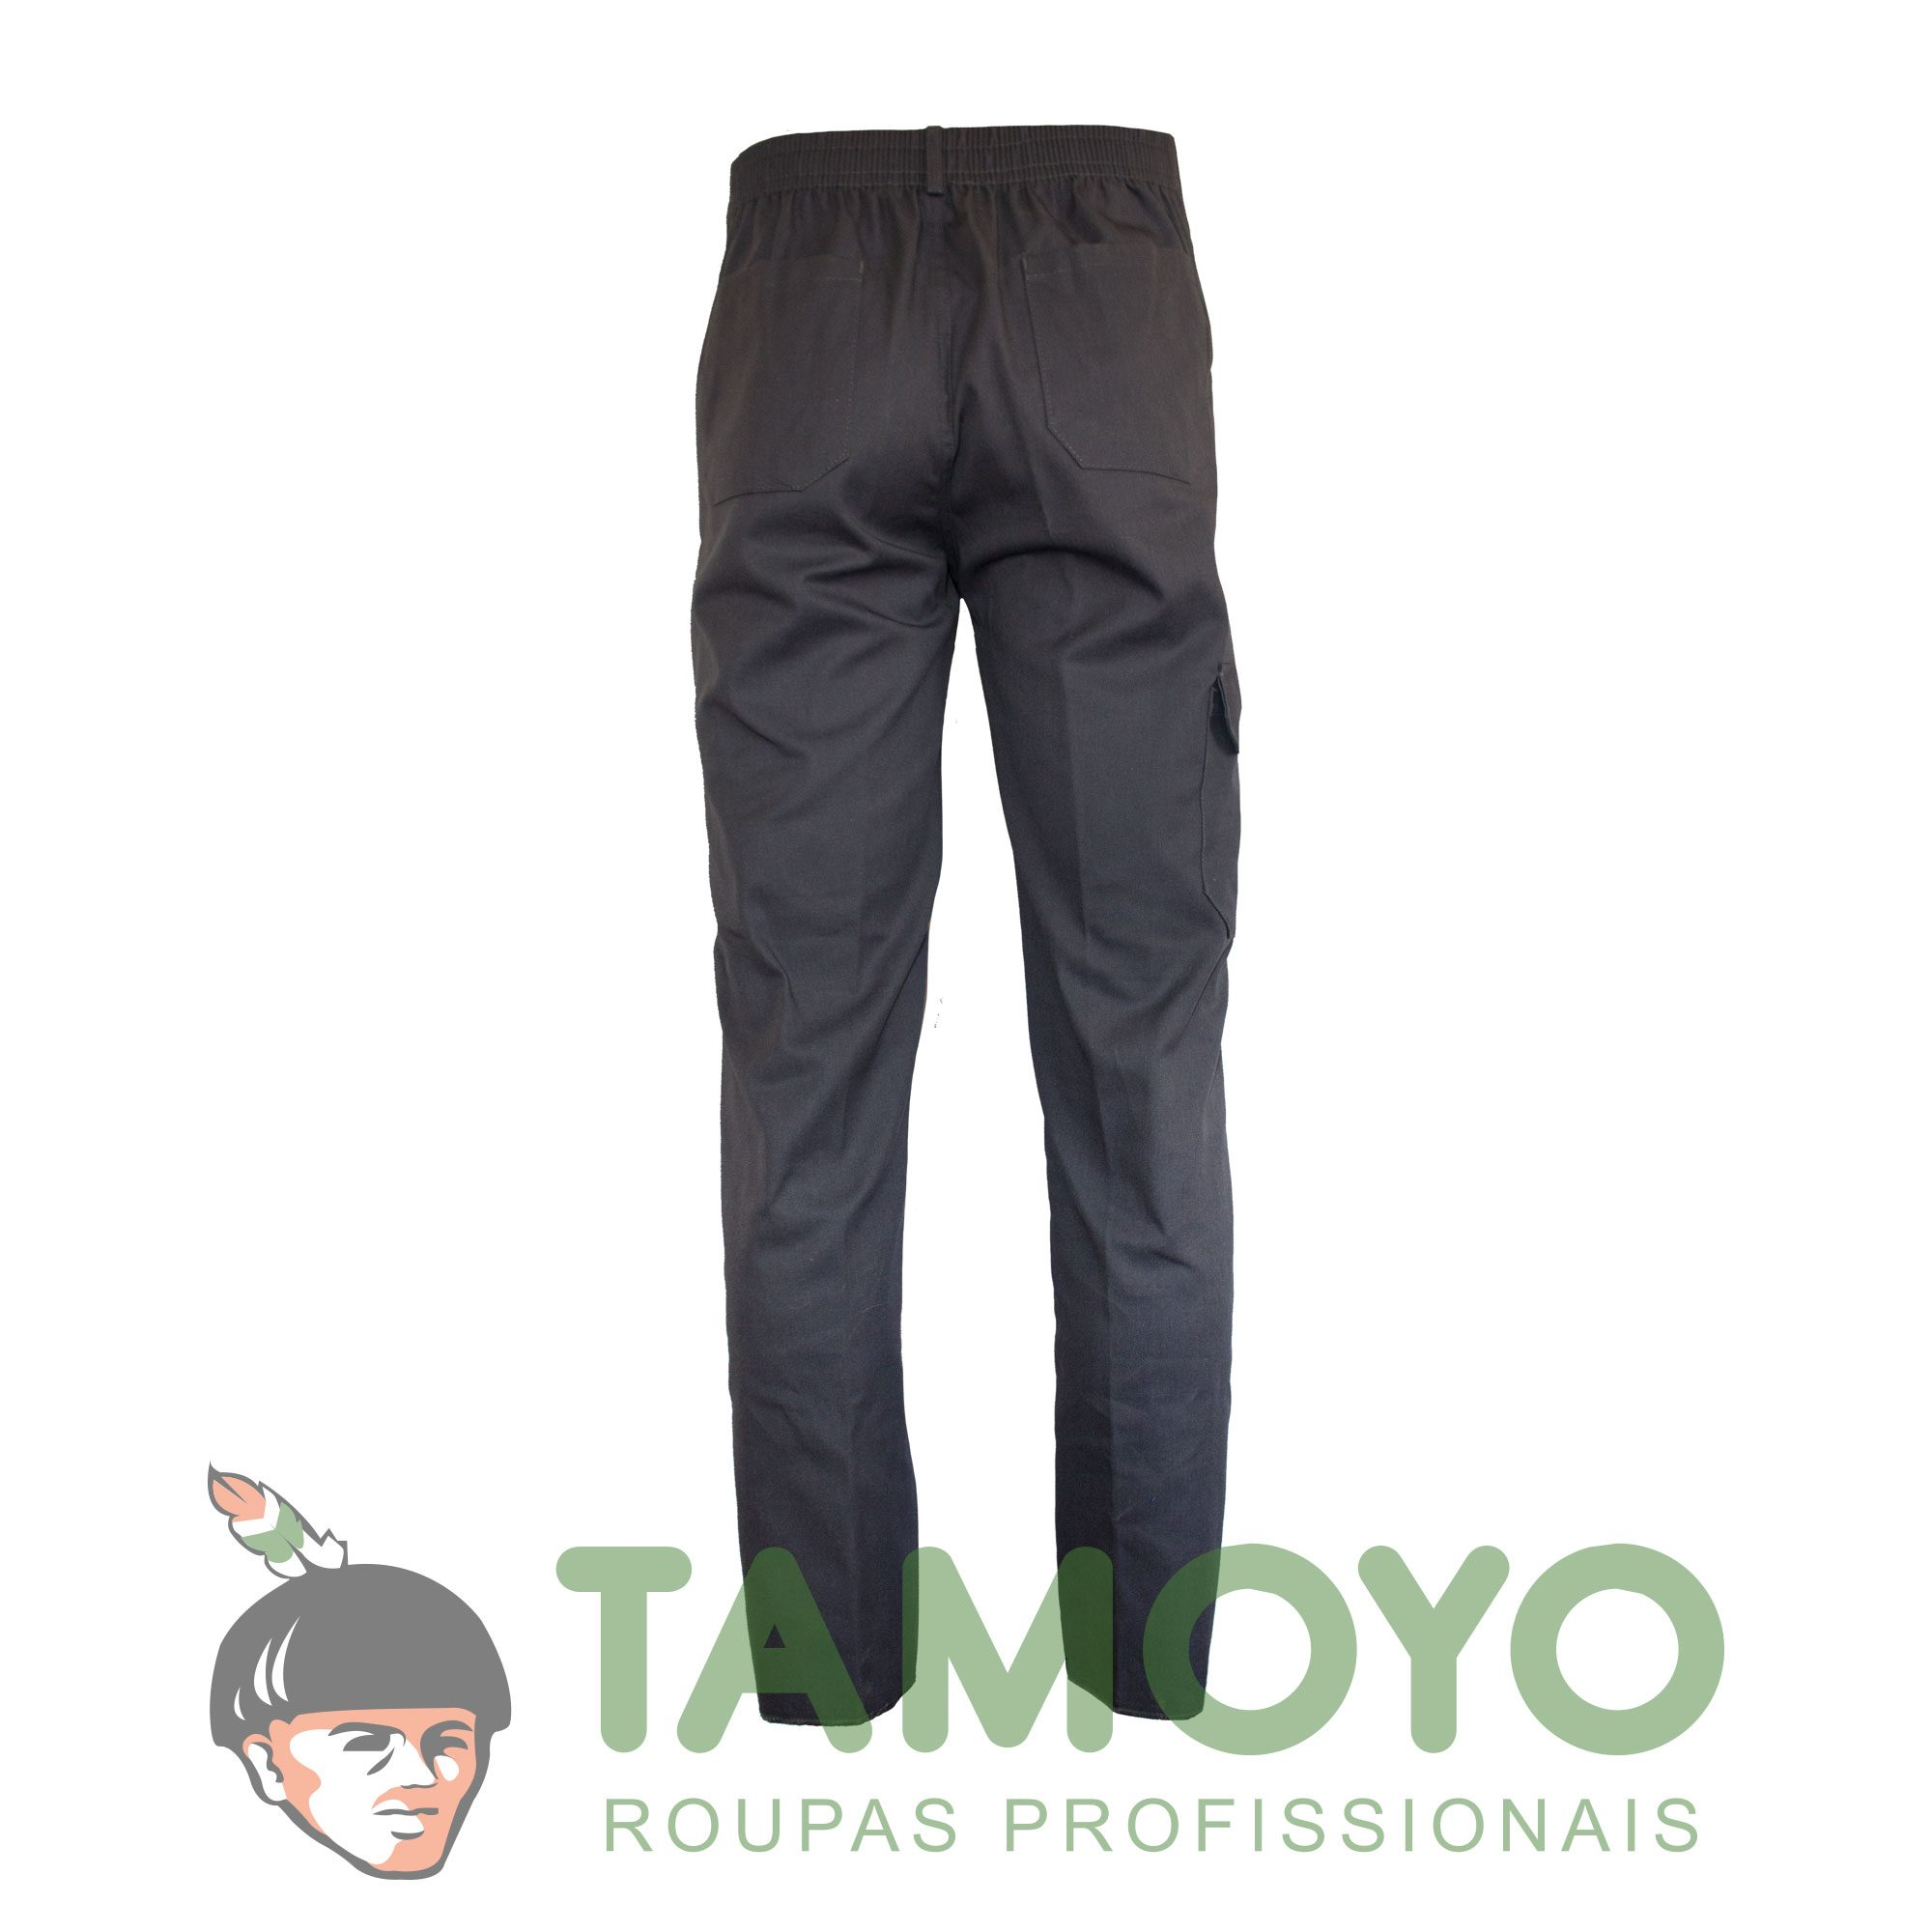 calca-frentista-masculino-boxter-roupas-tamoyo-uniformes-profissionais-c